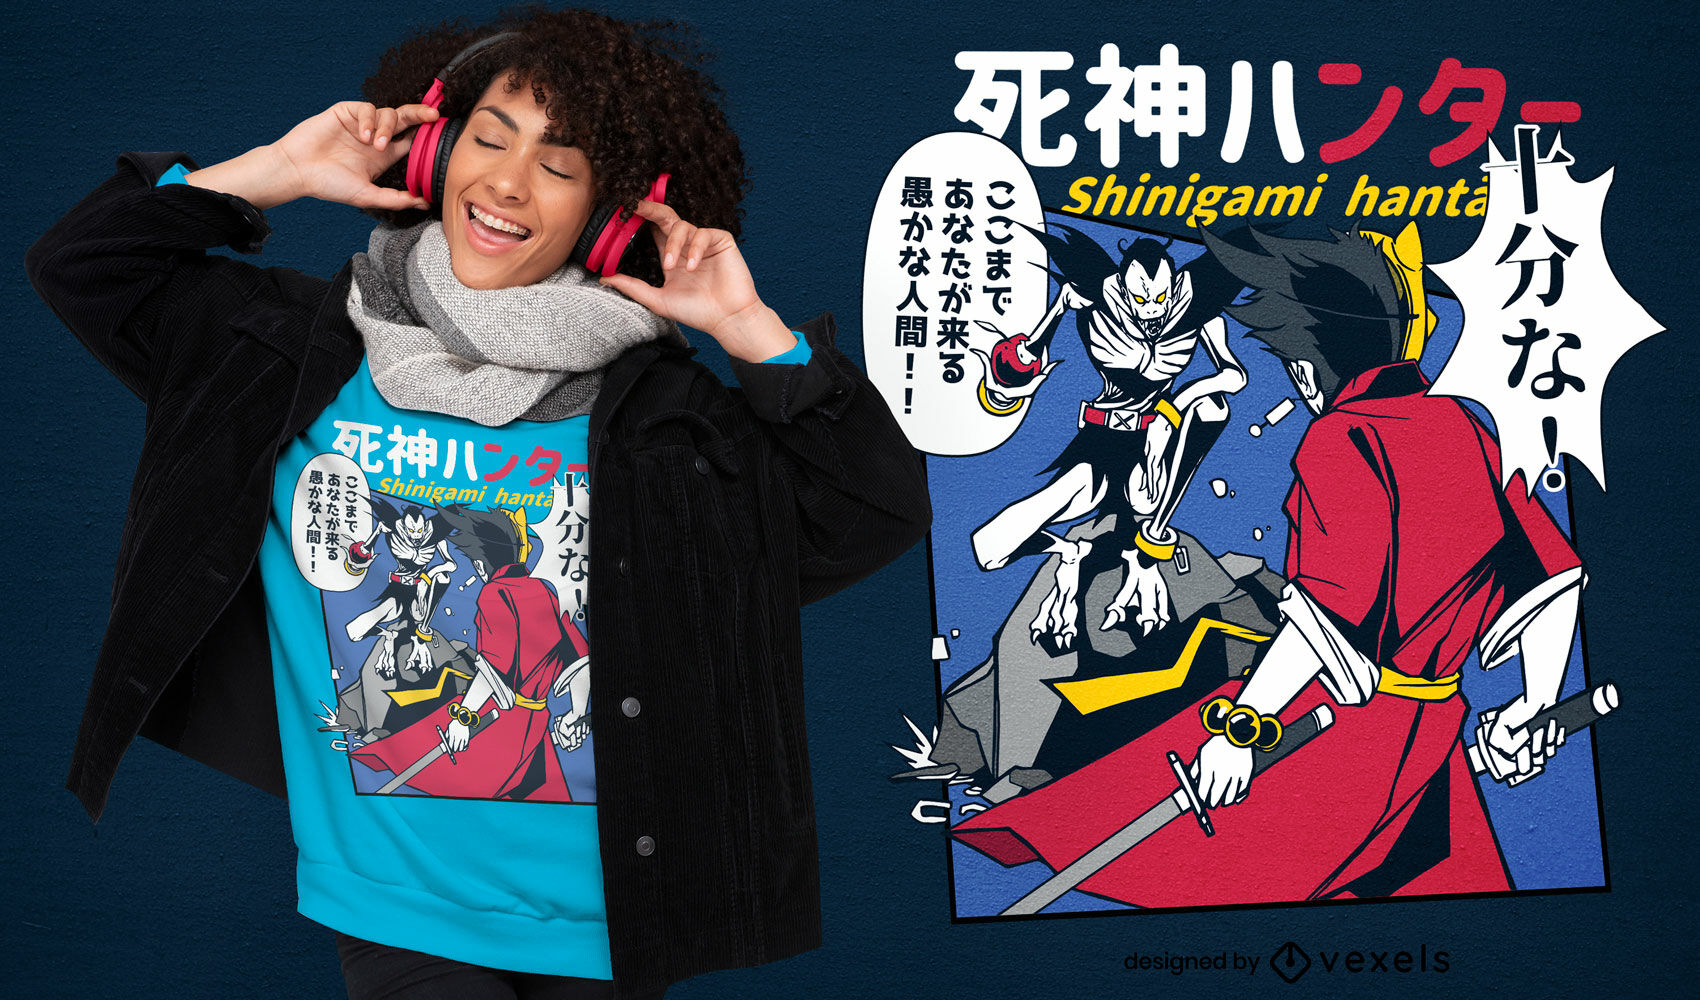 Diseño de camiseta de cómic monstruo japonés.